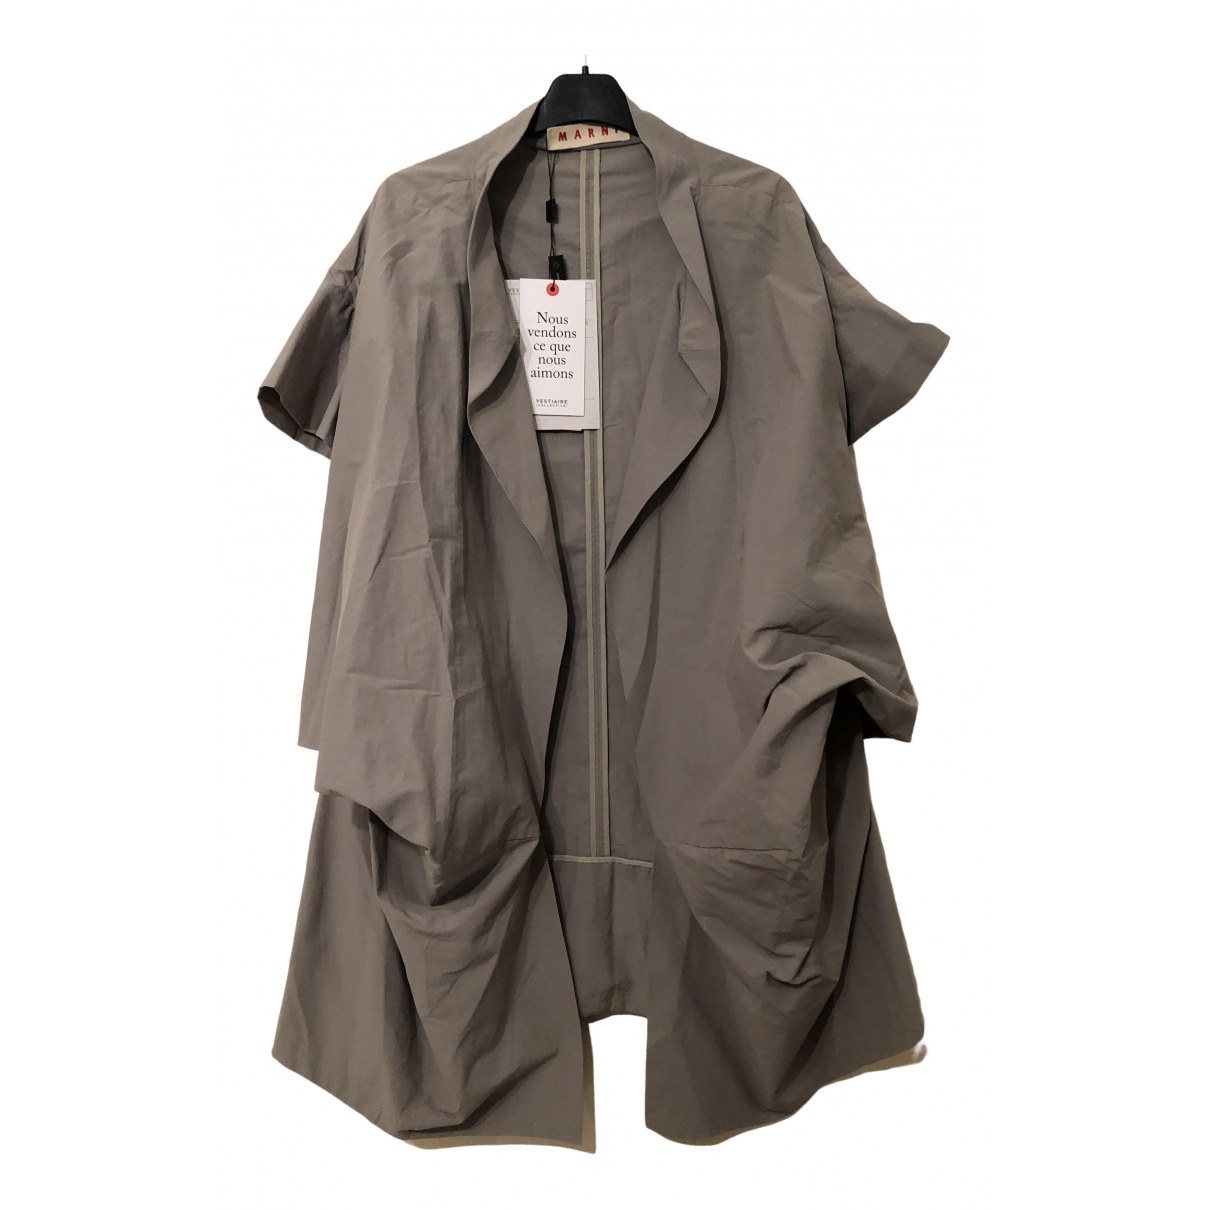 Marni \N Khaki Cotton coat for Women 38 IT